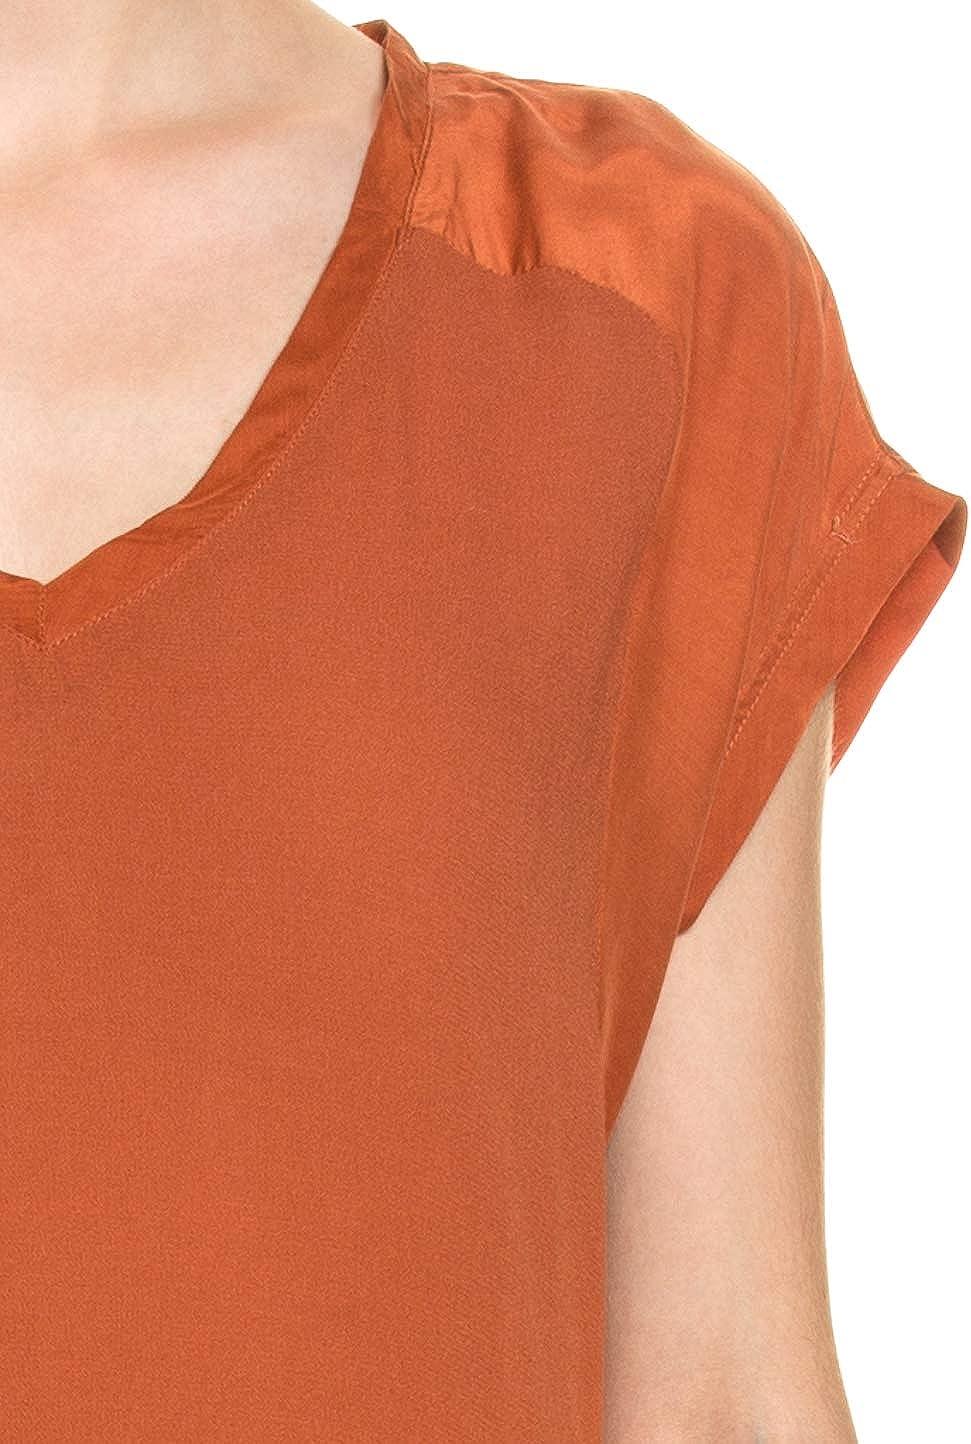 YAYA Short Sleeve Fabric Mix Dres Ladies Dress Baked Clay